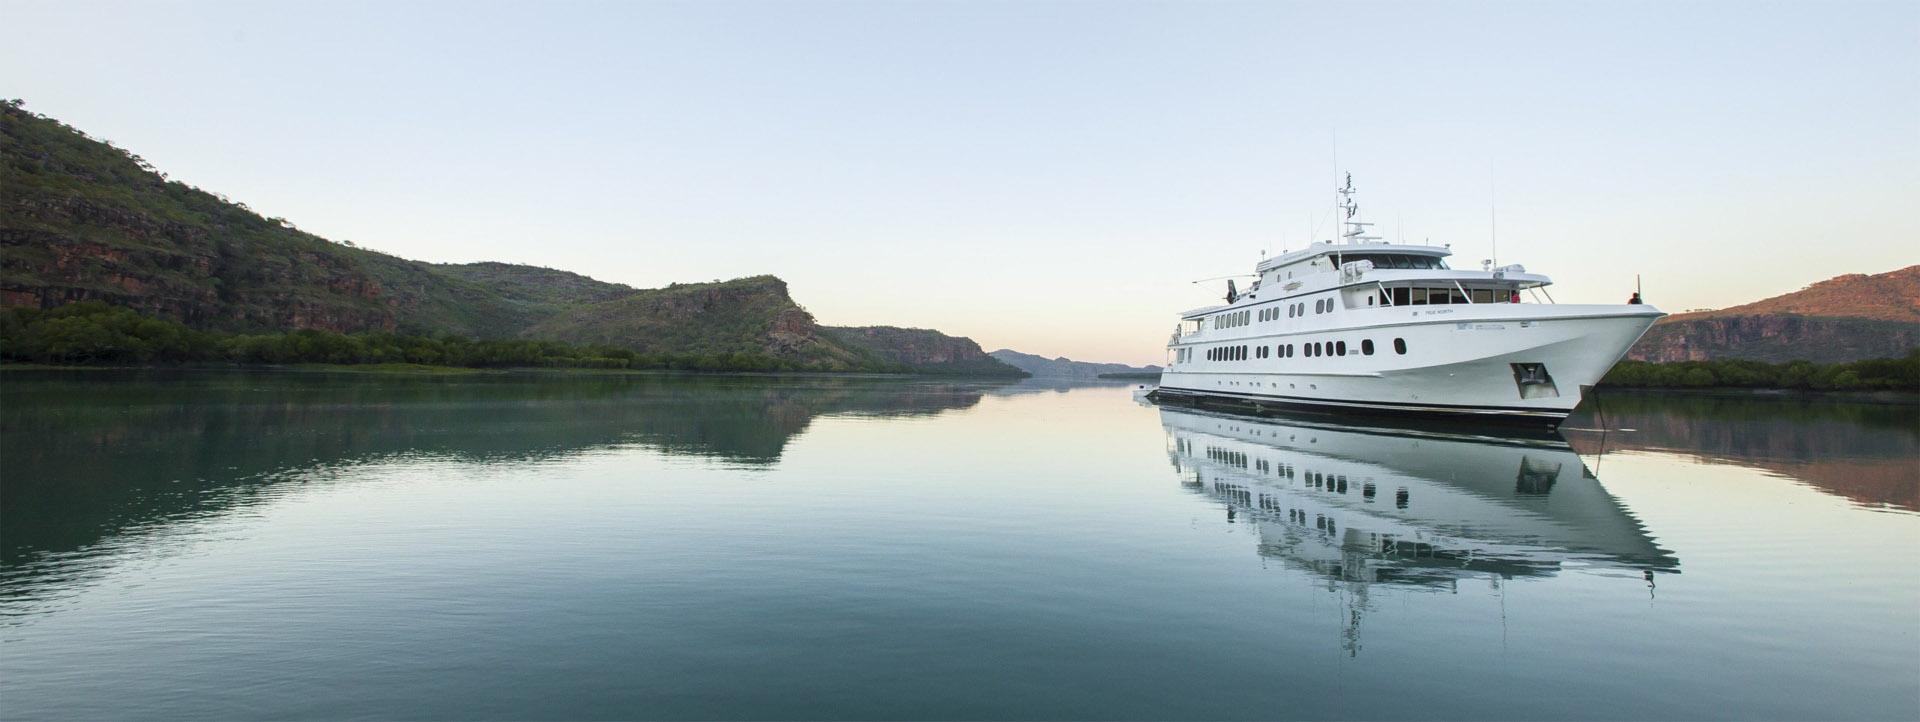 TRUE NORTH Kimberley cruise still waters